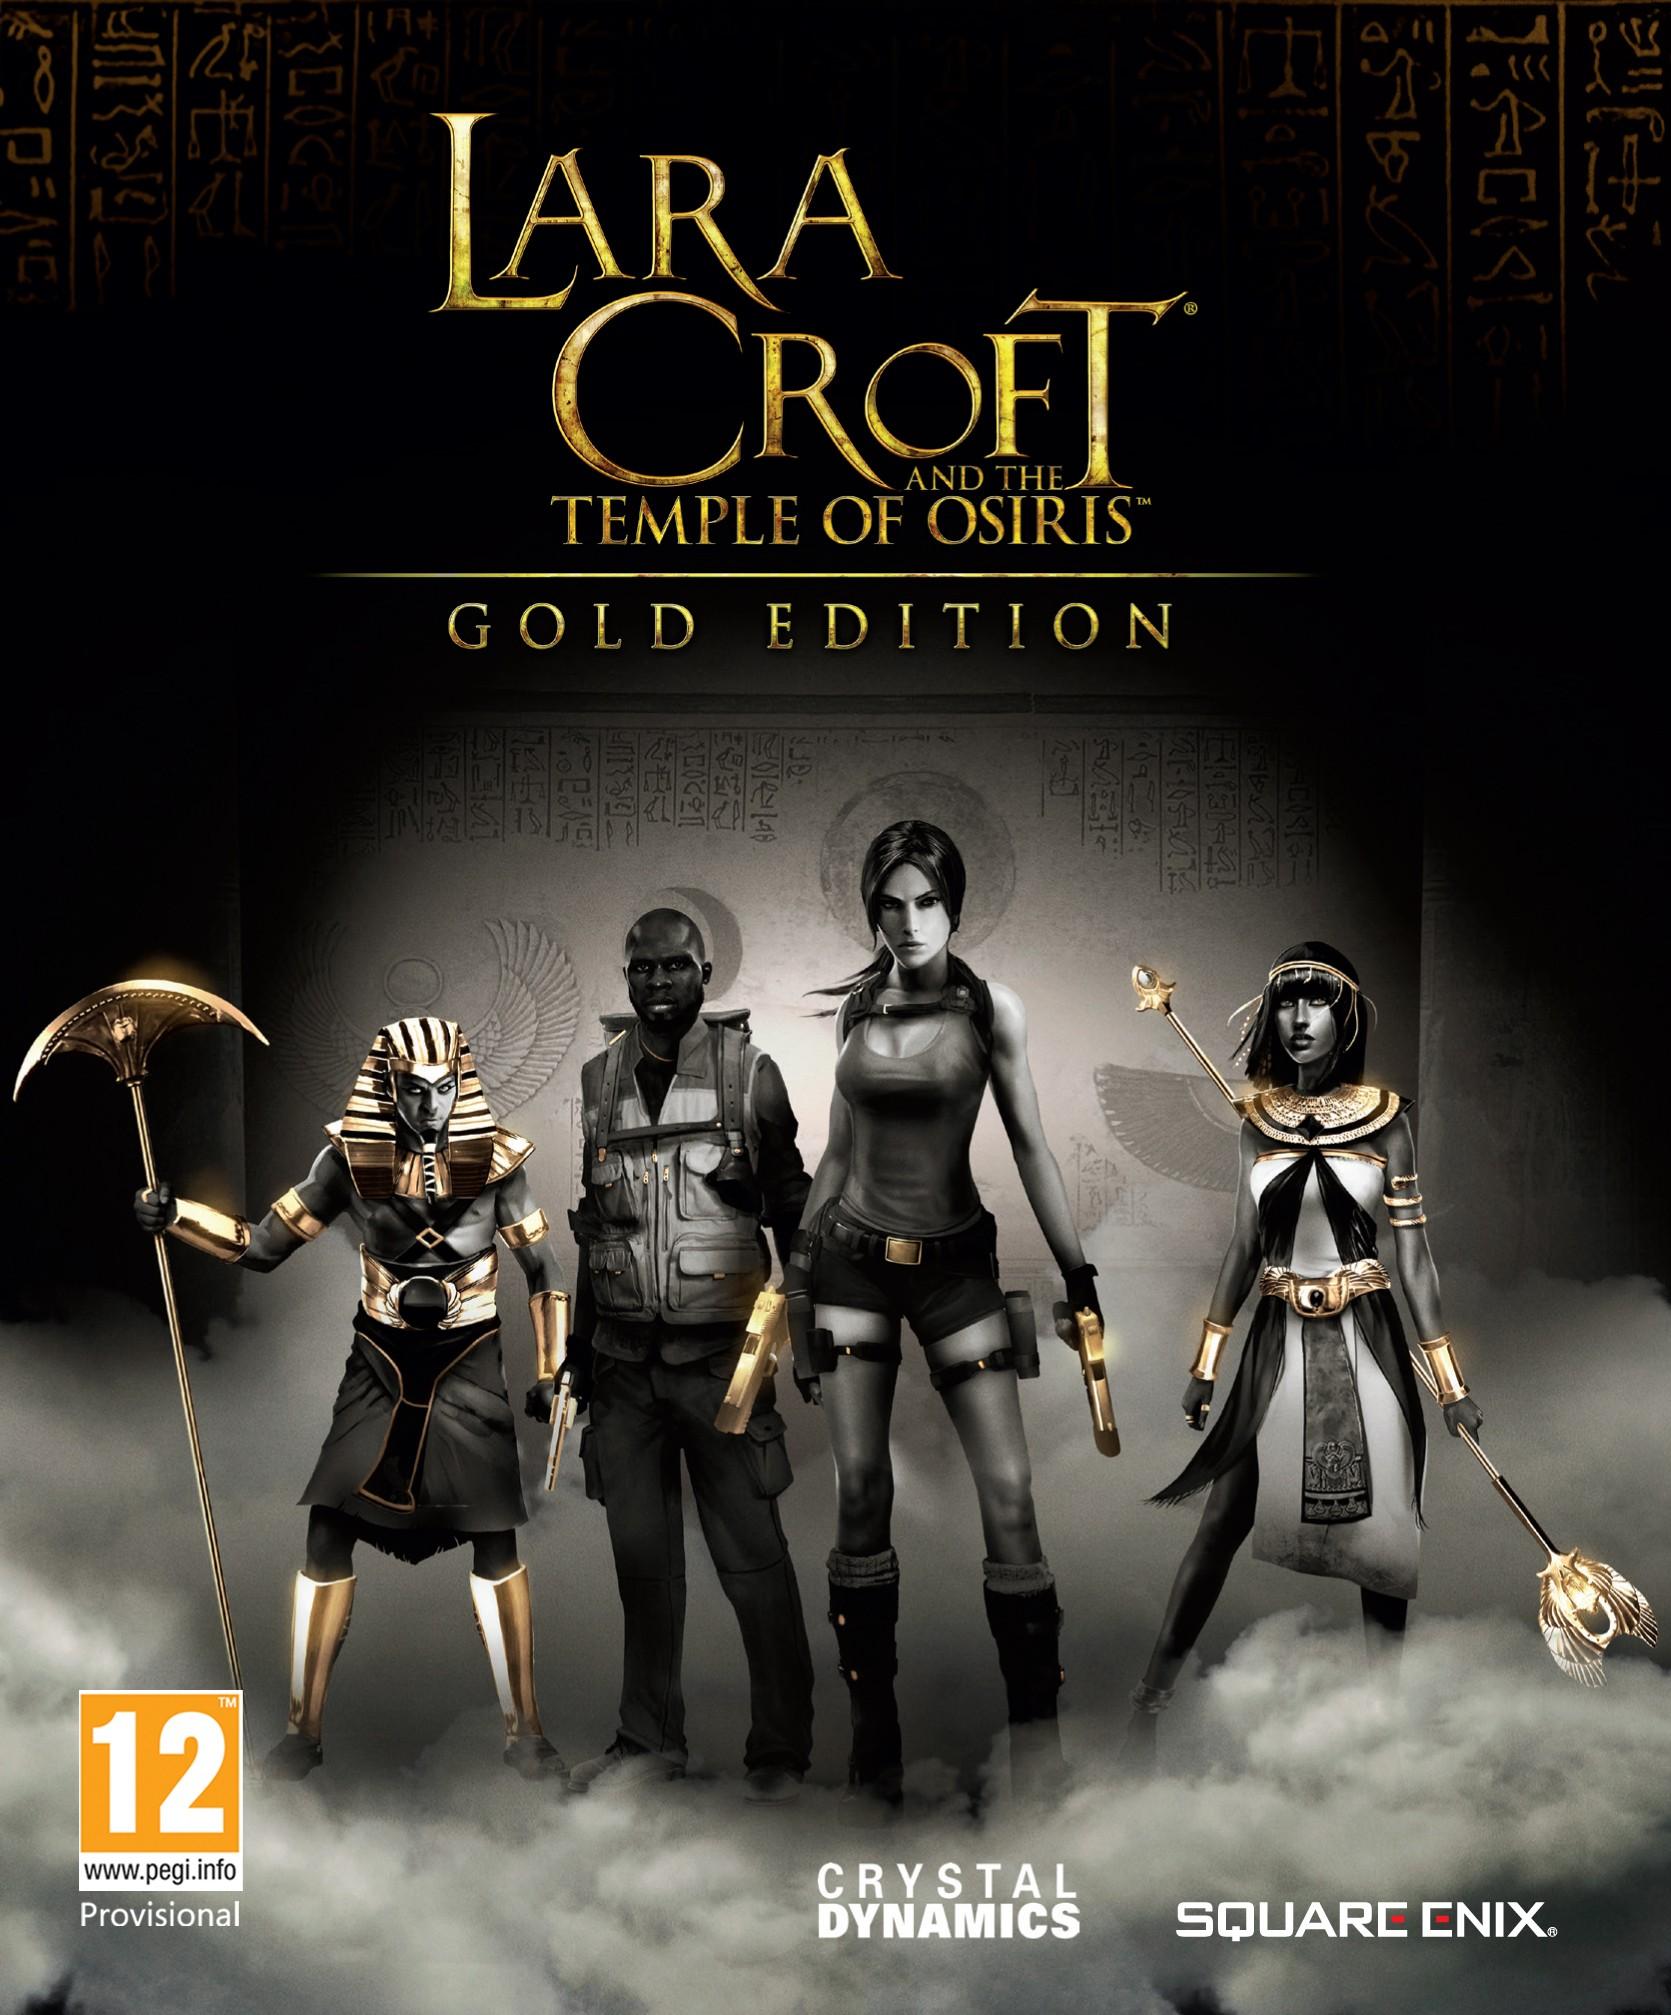 E111053 : Lara Croft and the Temple of Osiris Gold Edition (PC)